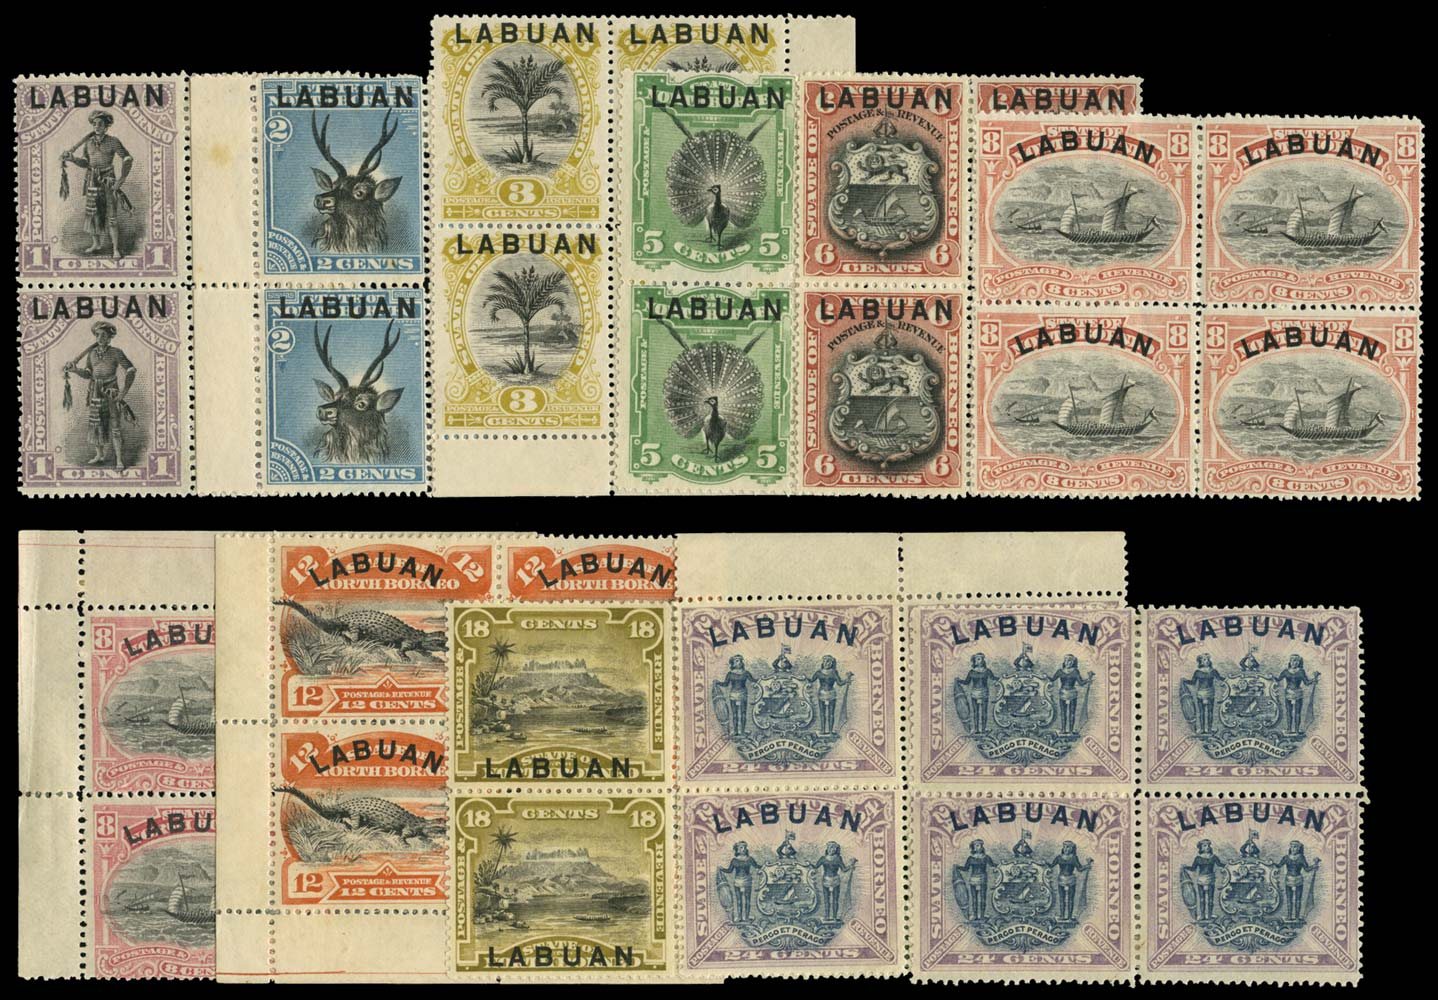 LABUAN 1894  SG62/74a Mint